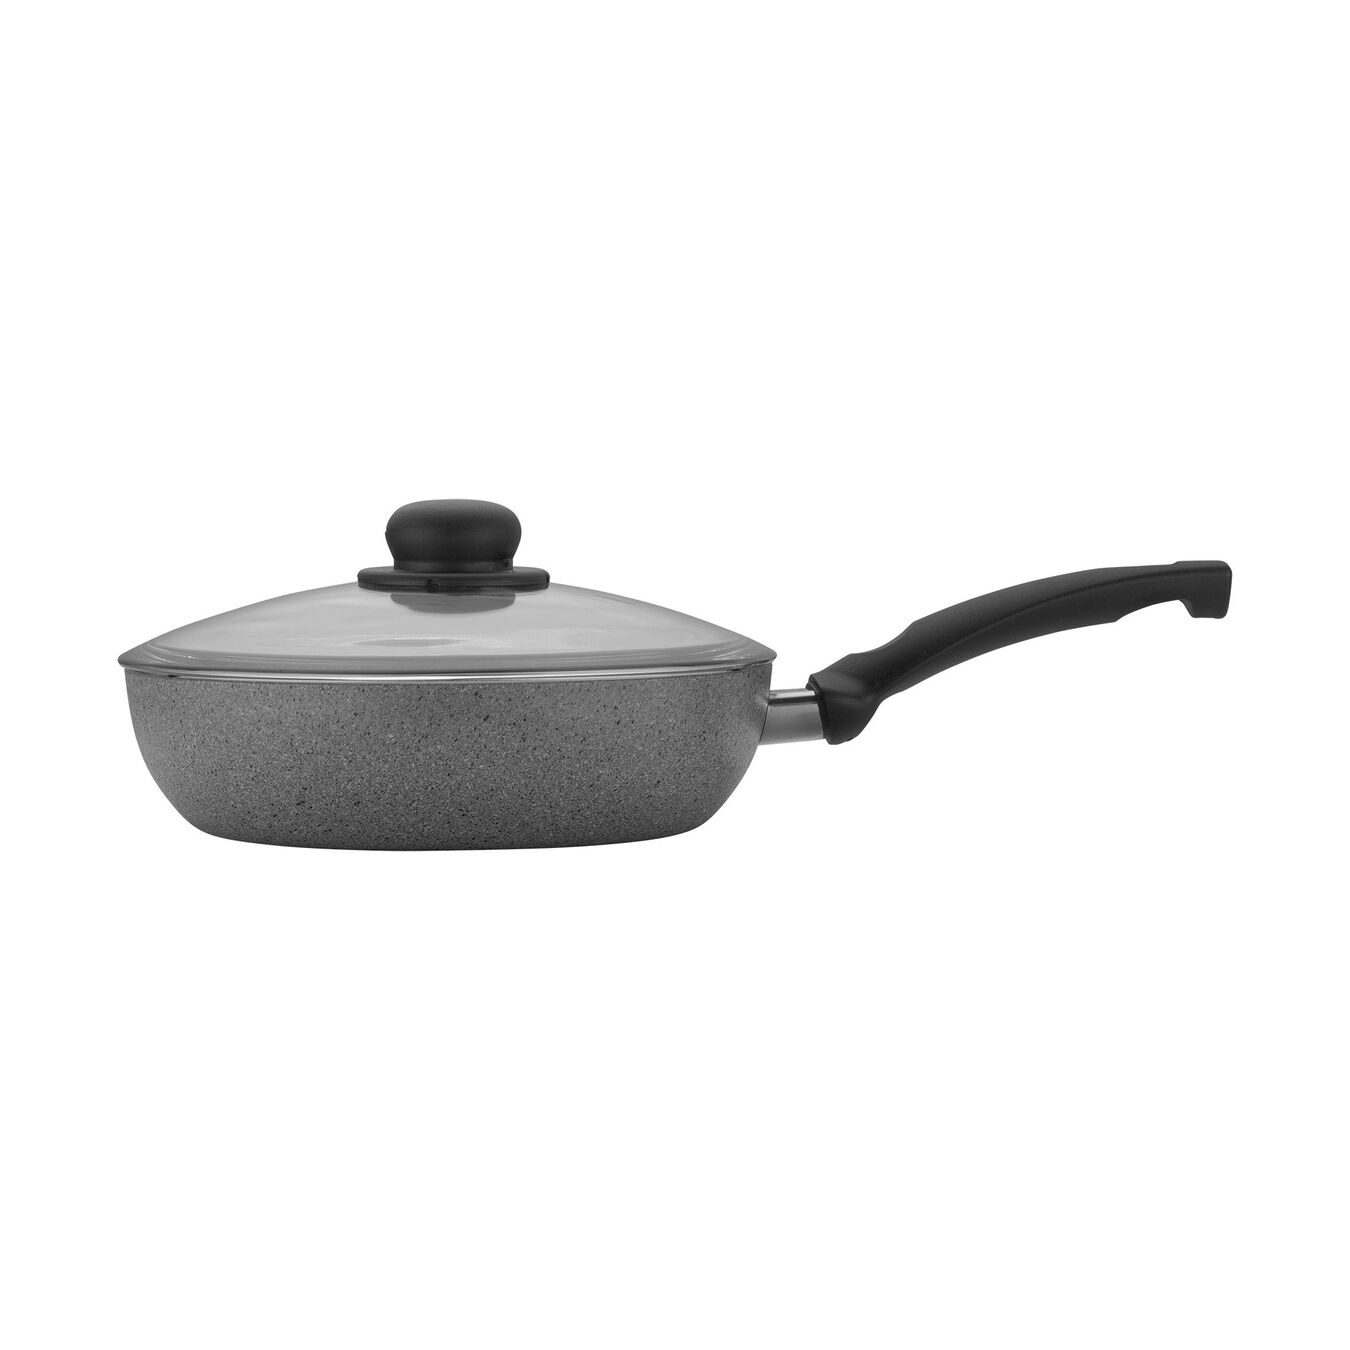 10 Piece Aluminum Cookware set,,large 6